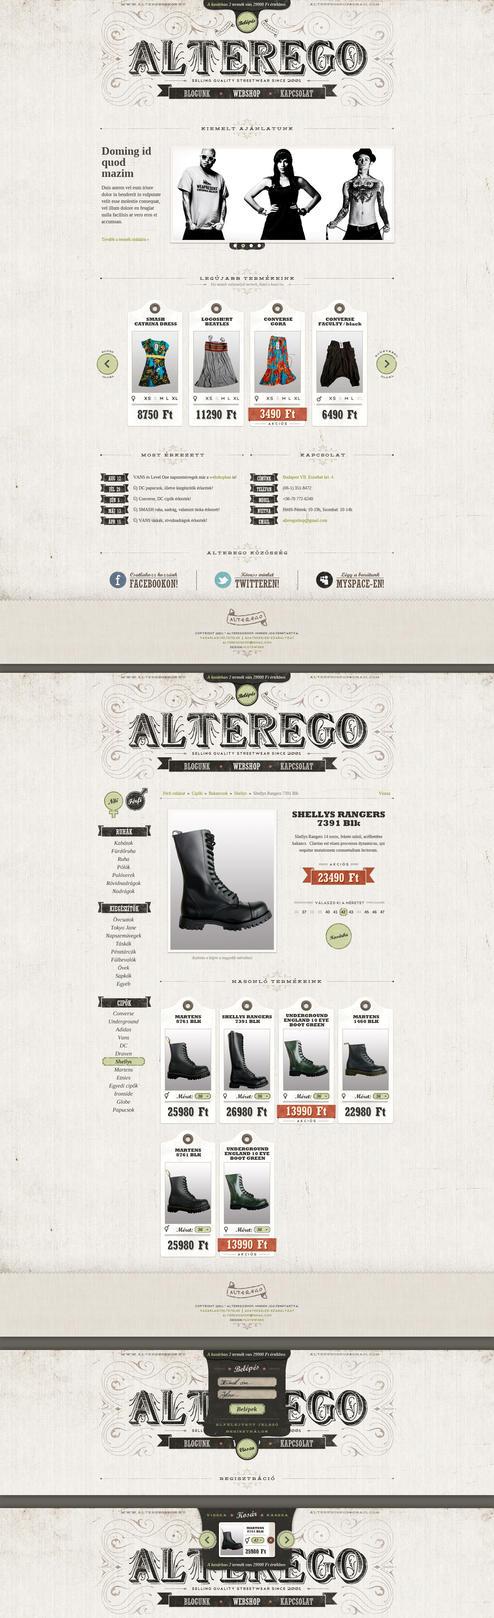 Alteregoshop redesign by floydworx